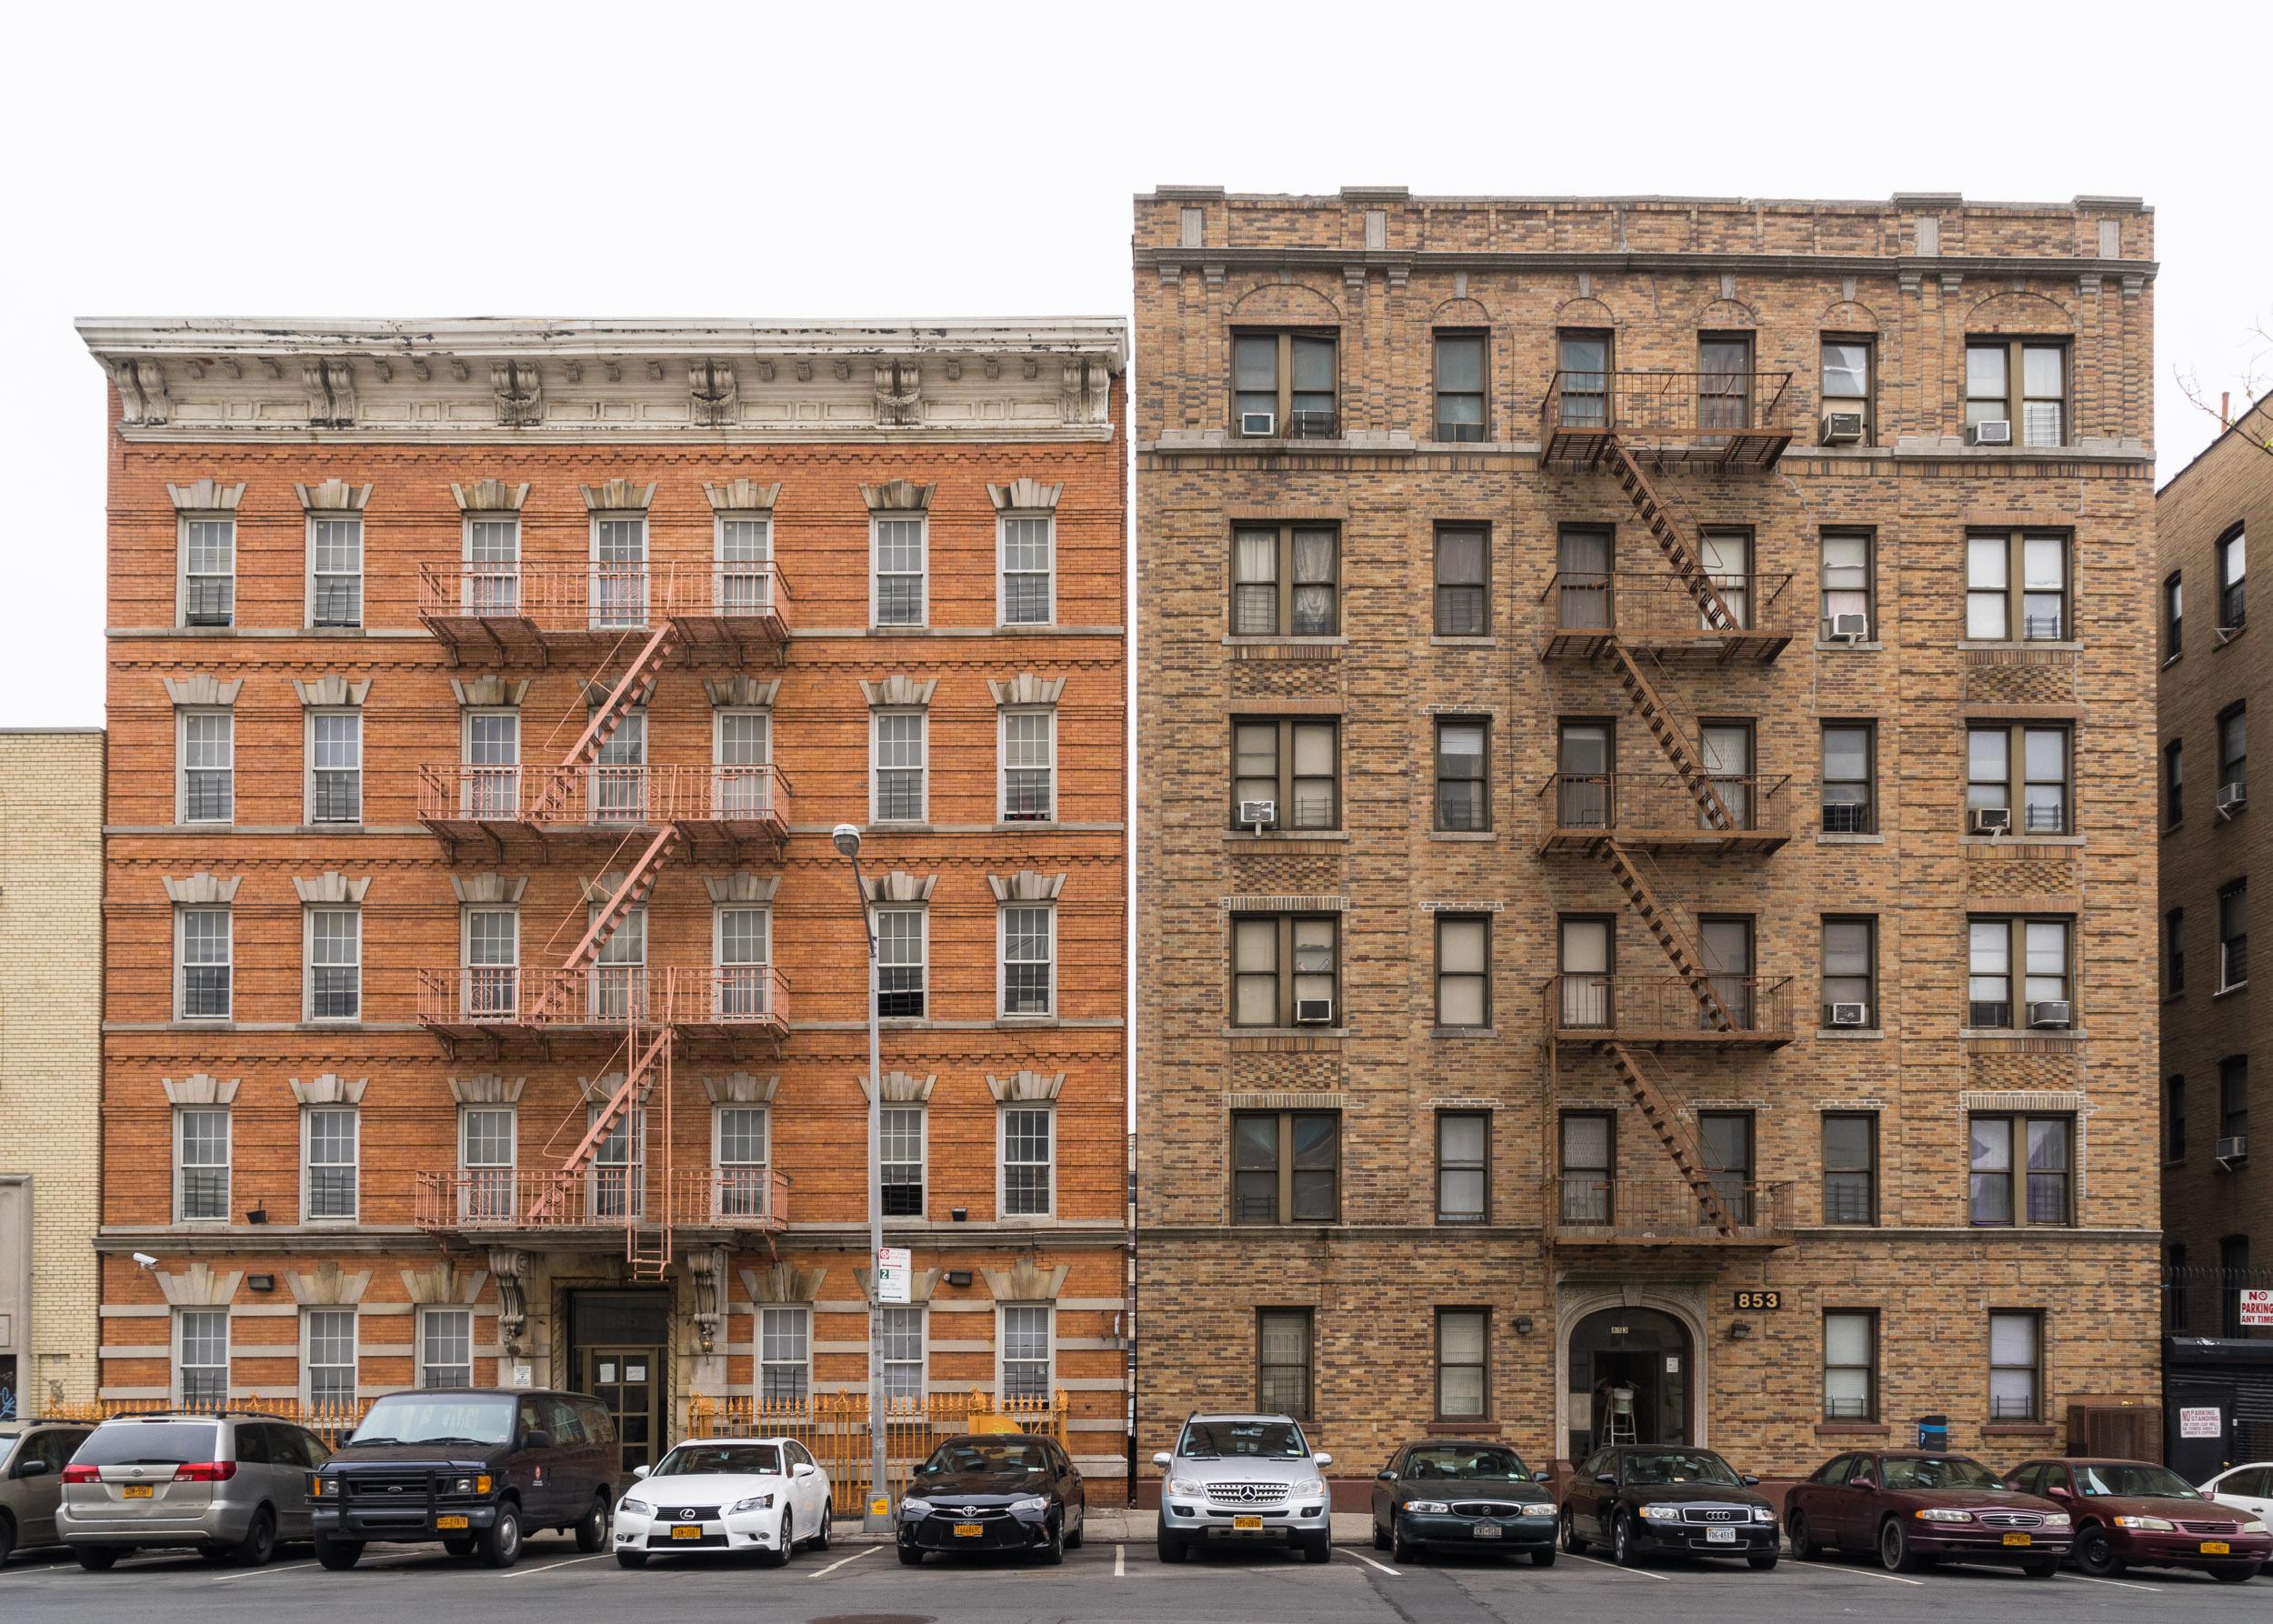 Bronx_kg081.jpg